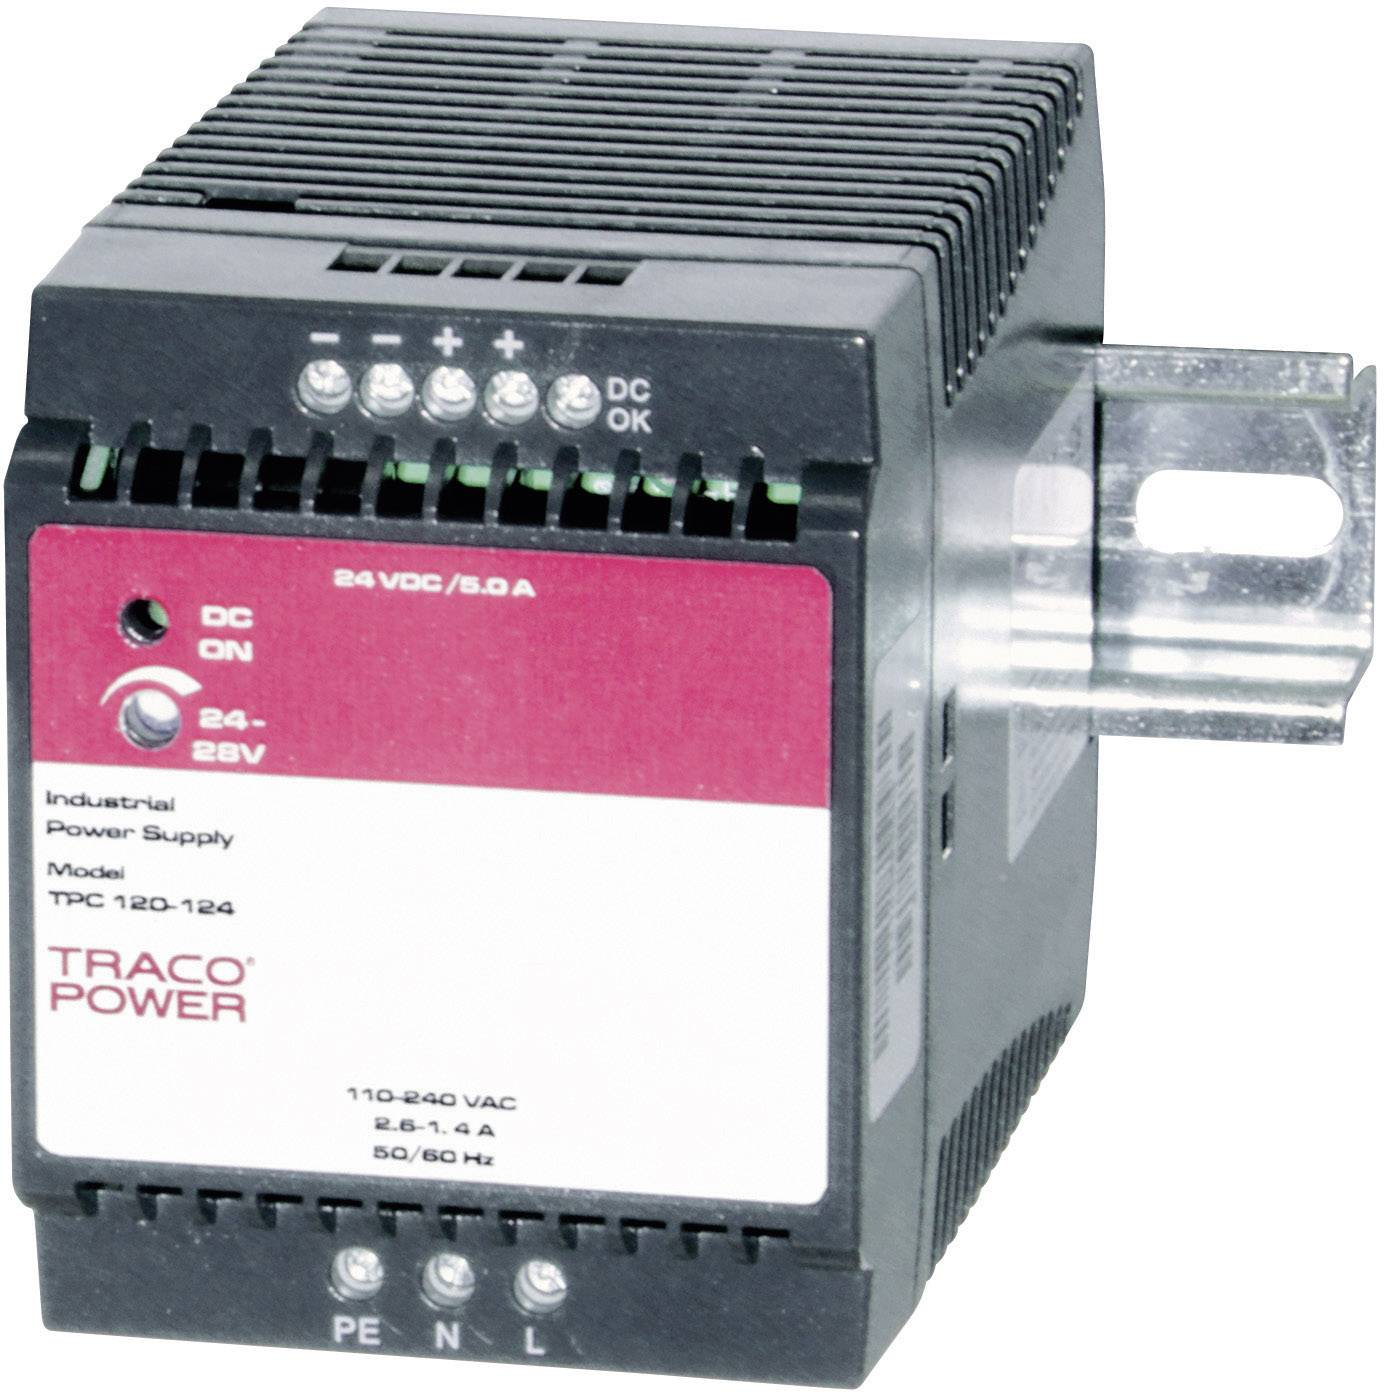 Zdroj na DIN lištu TracoPower TPC 120-112, 12 - 15 V/DC, 8 A